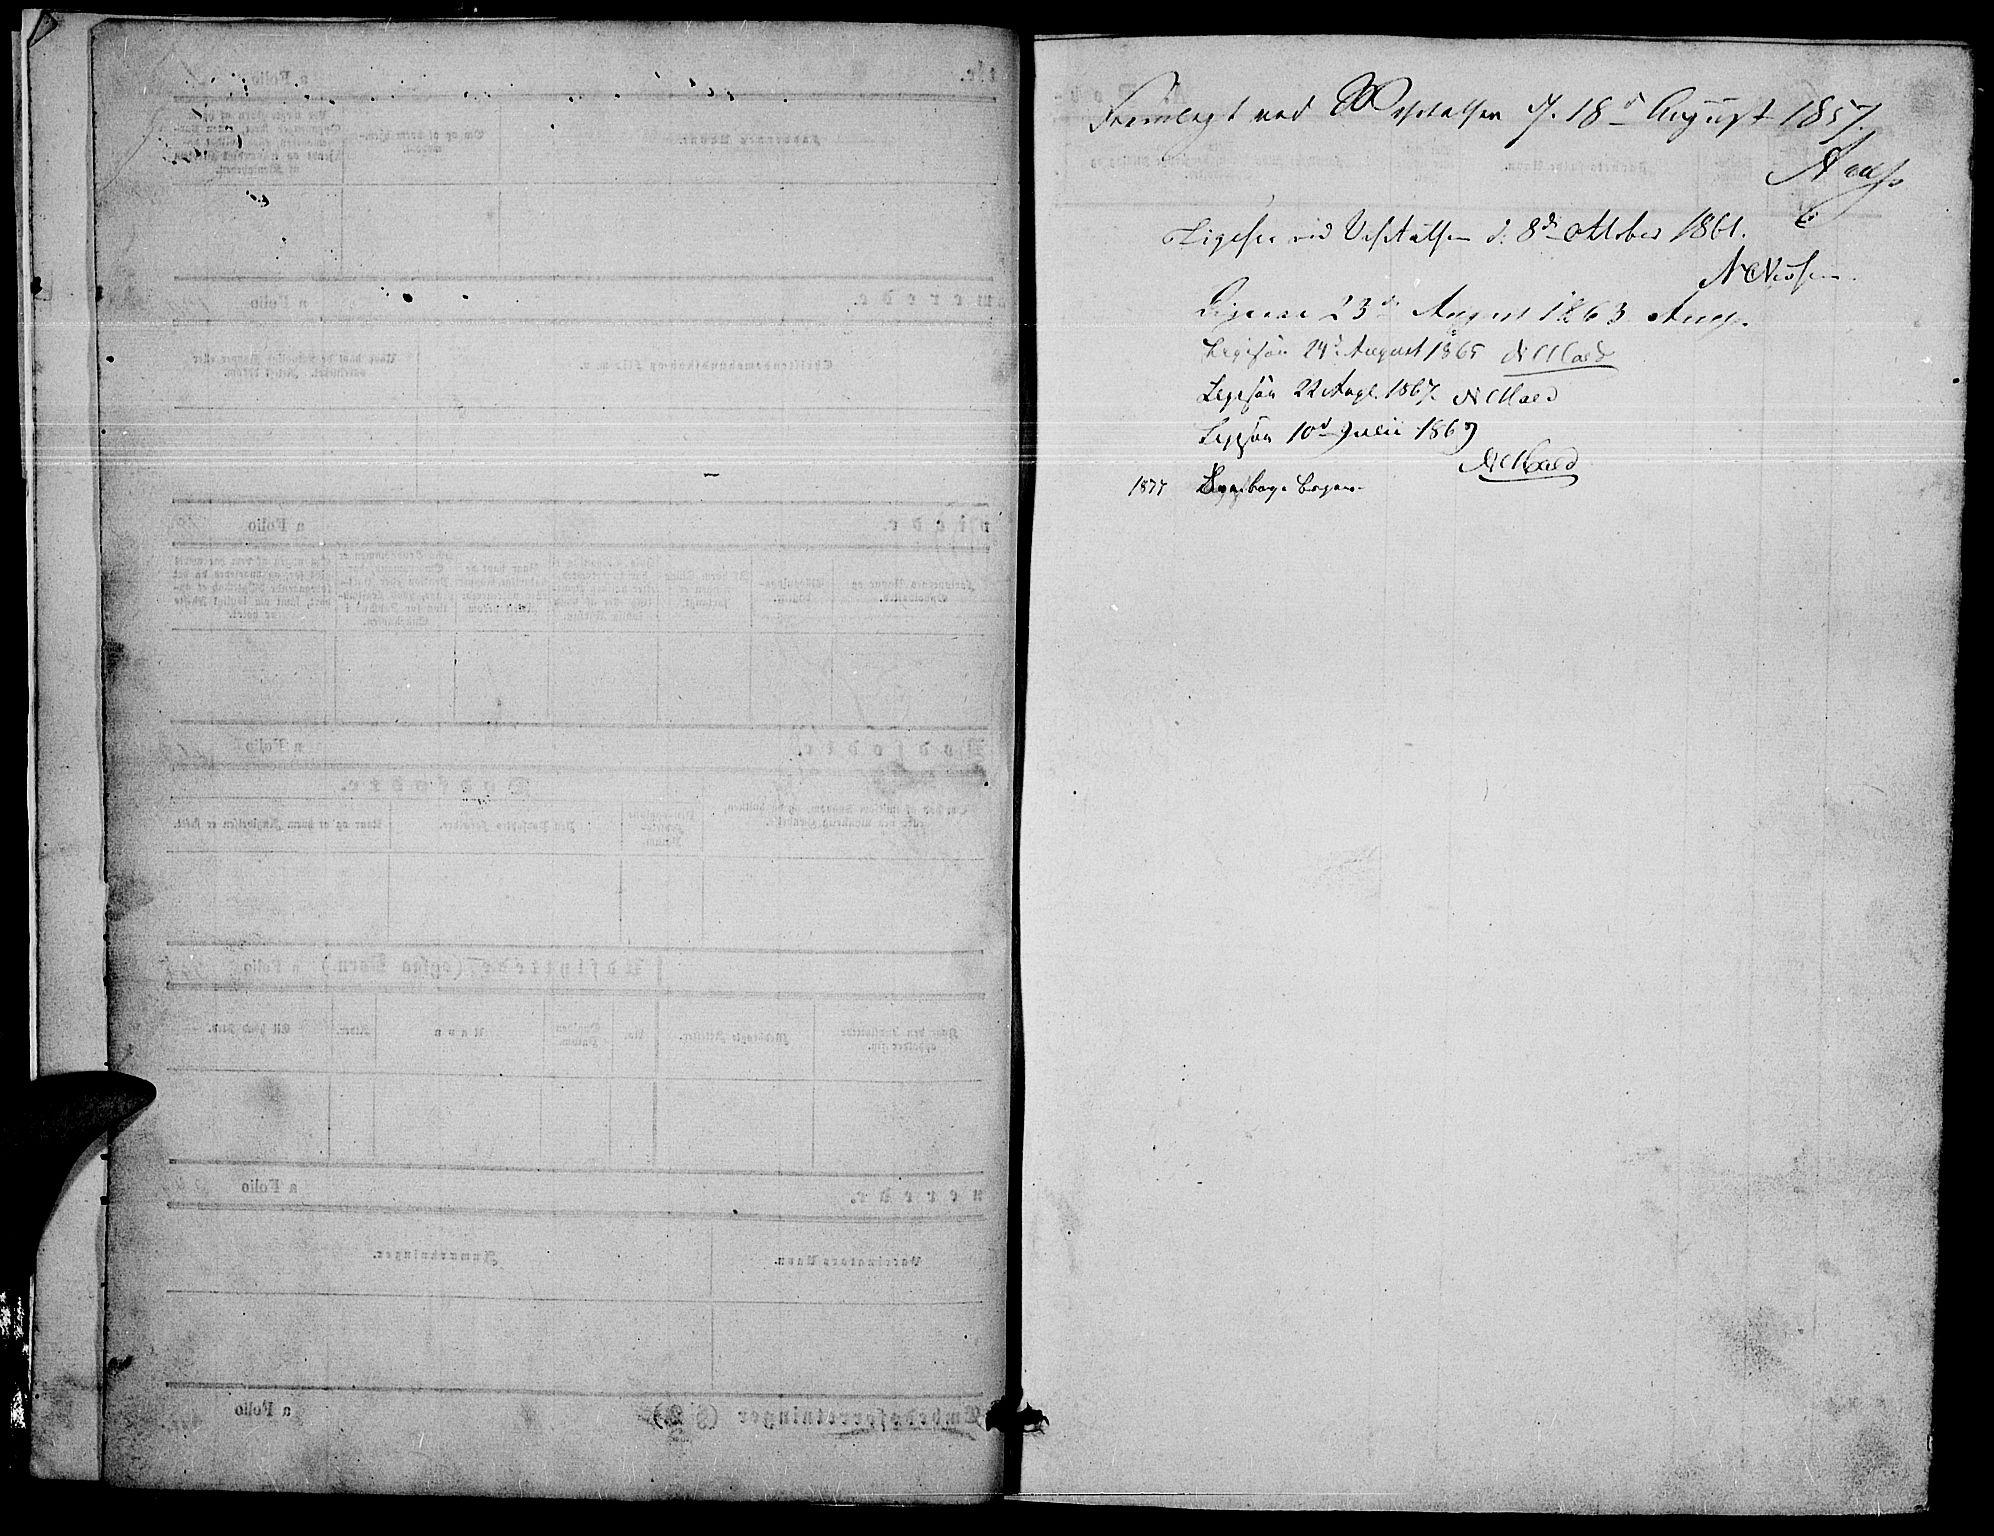 SAH, Nord-Fron prestekontor, Klokkerbok nr. 2, 1851-1883